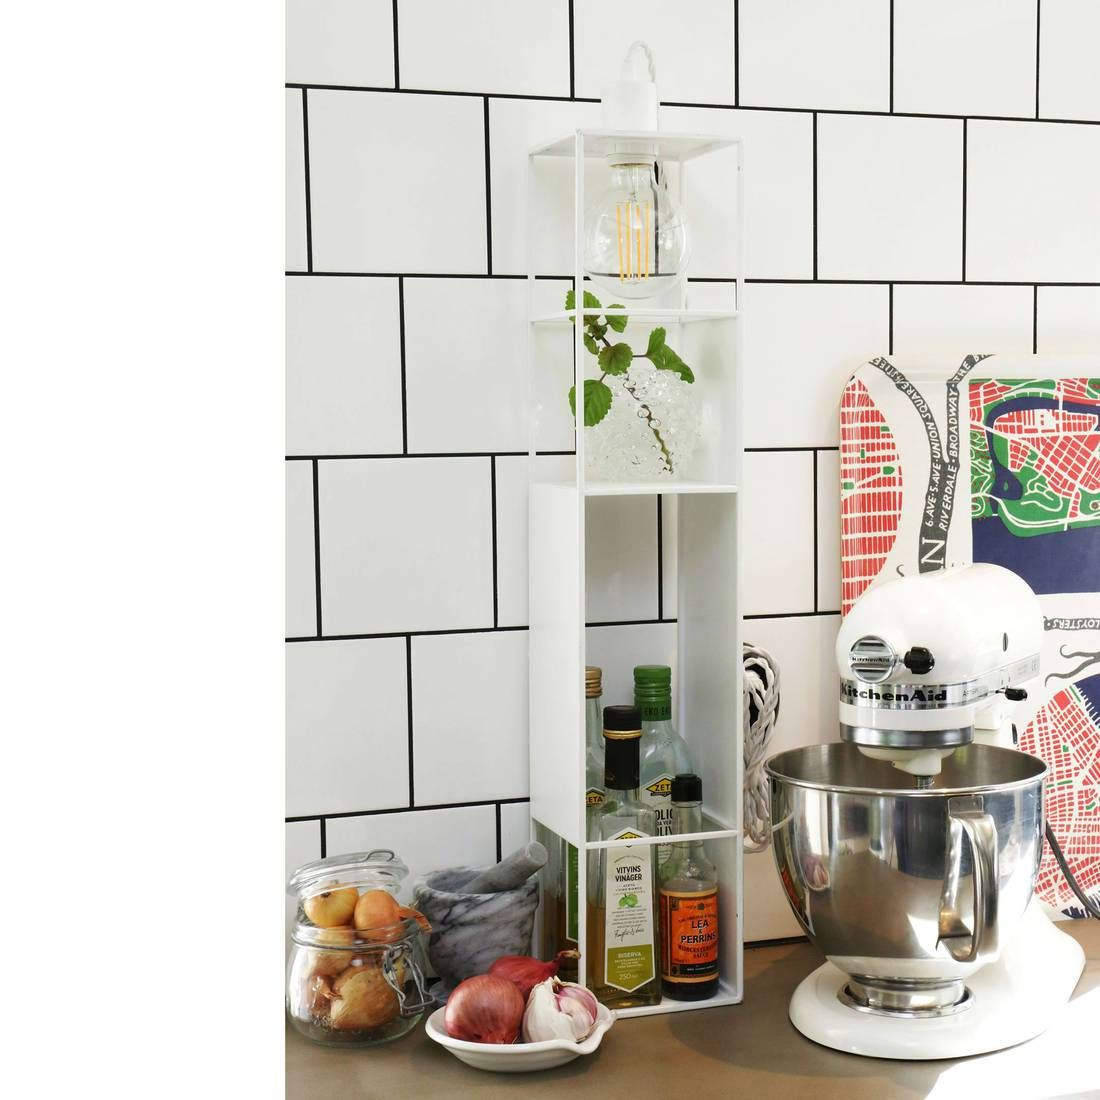 Ampoule Vertigo Petite Friture 86 best cuisine images in 2020 | home decor, ceiling lights